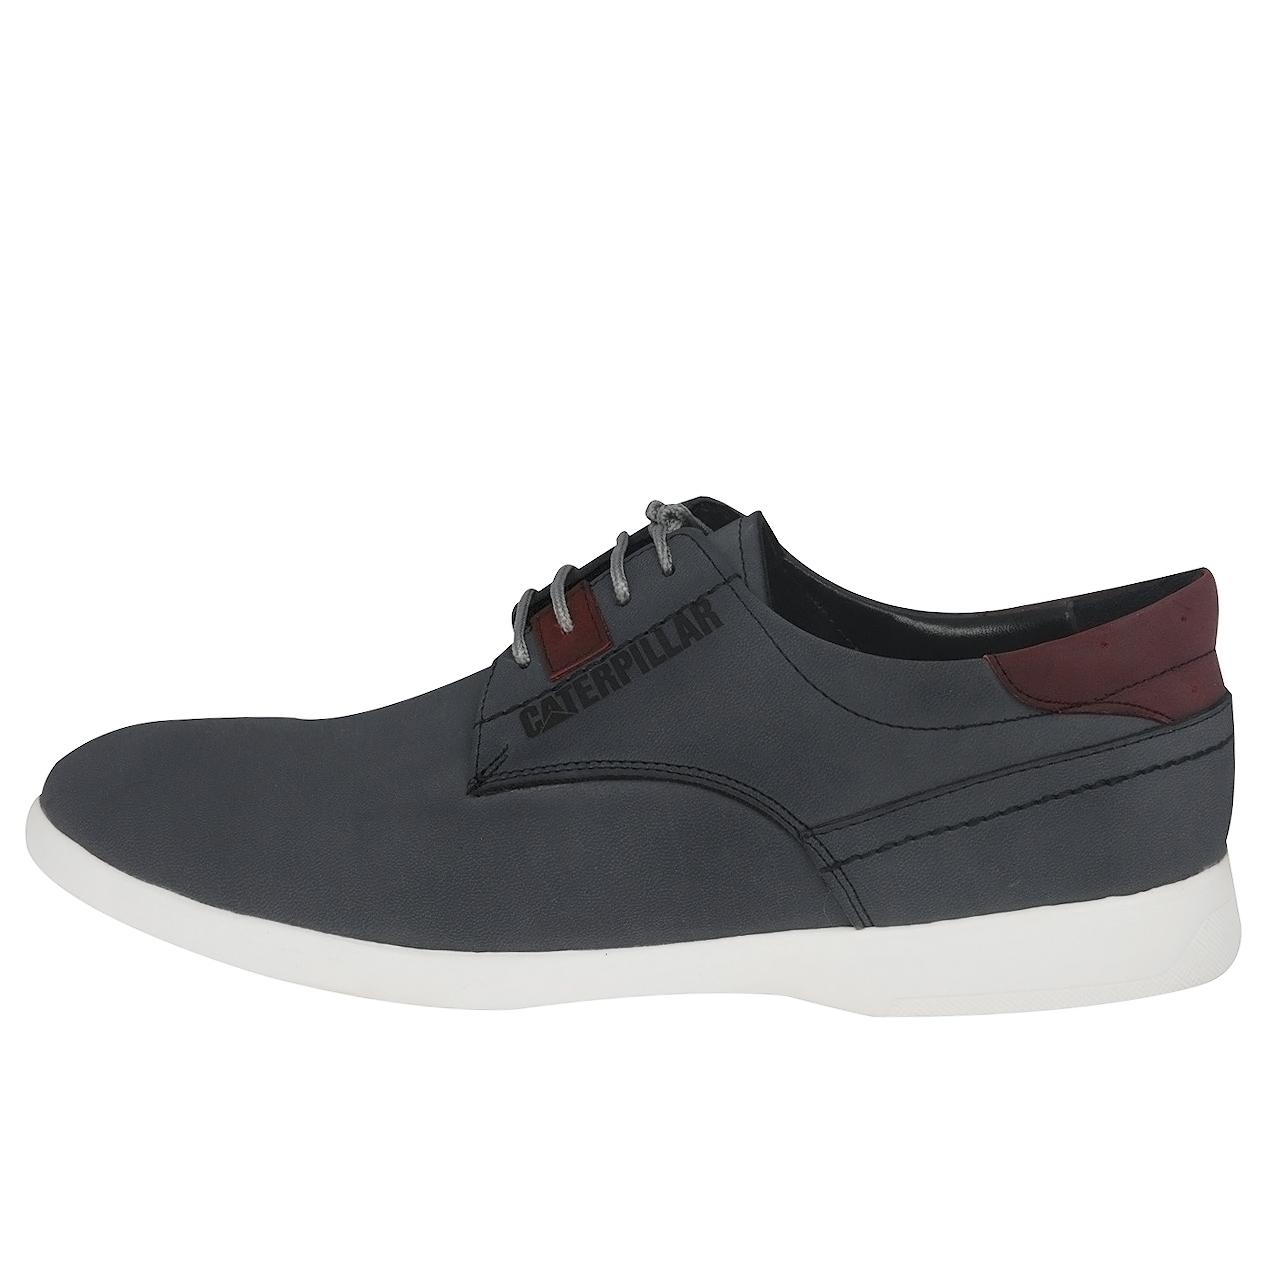 کفش روزمره زنانه مدل  324001215